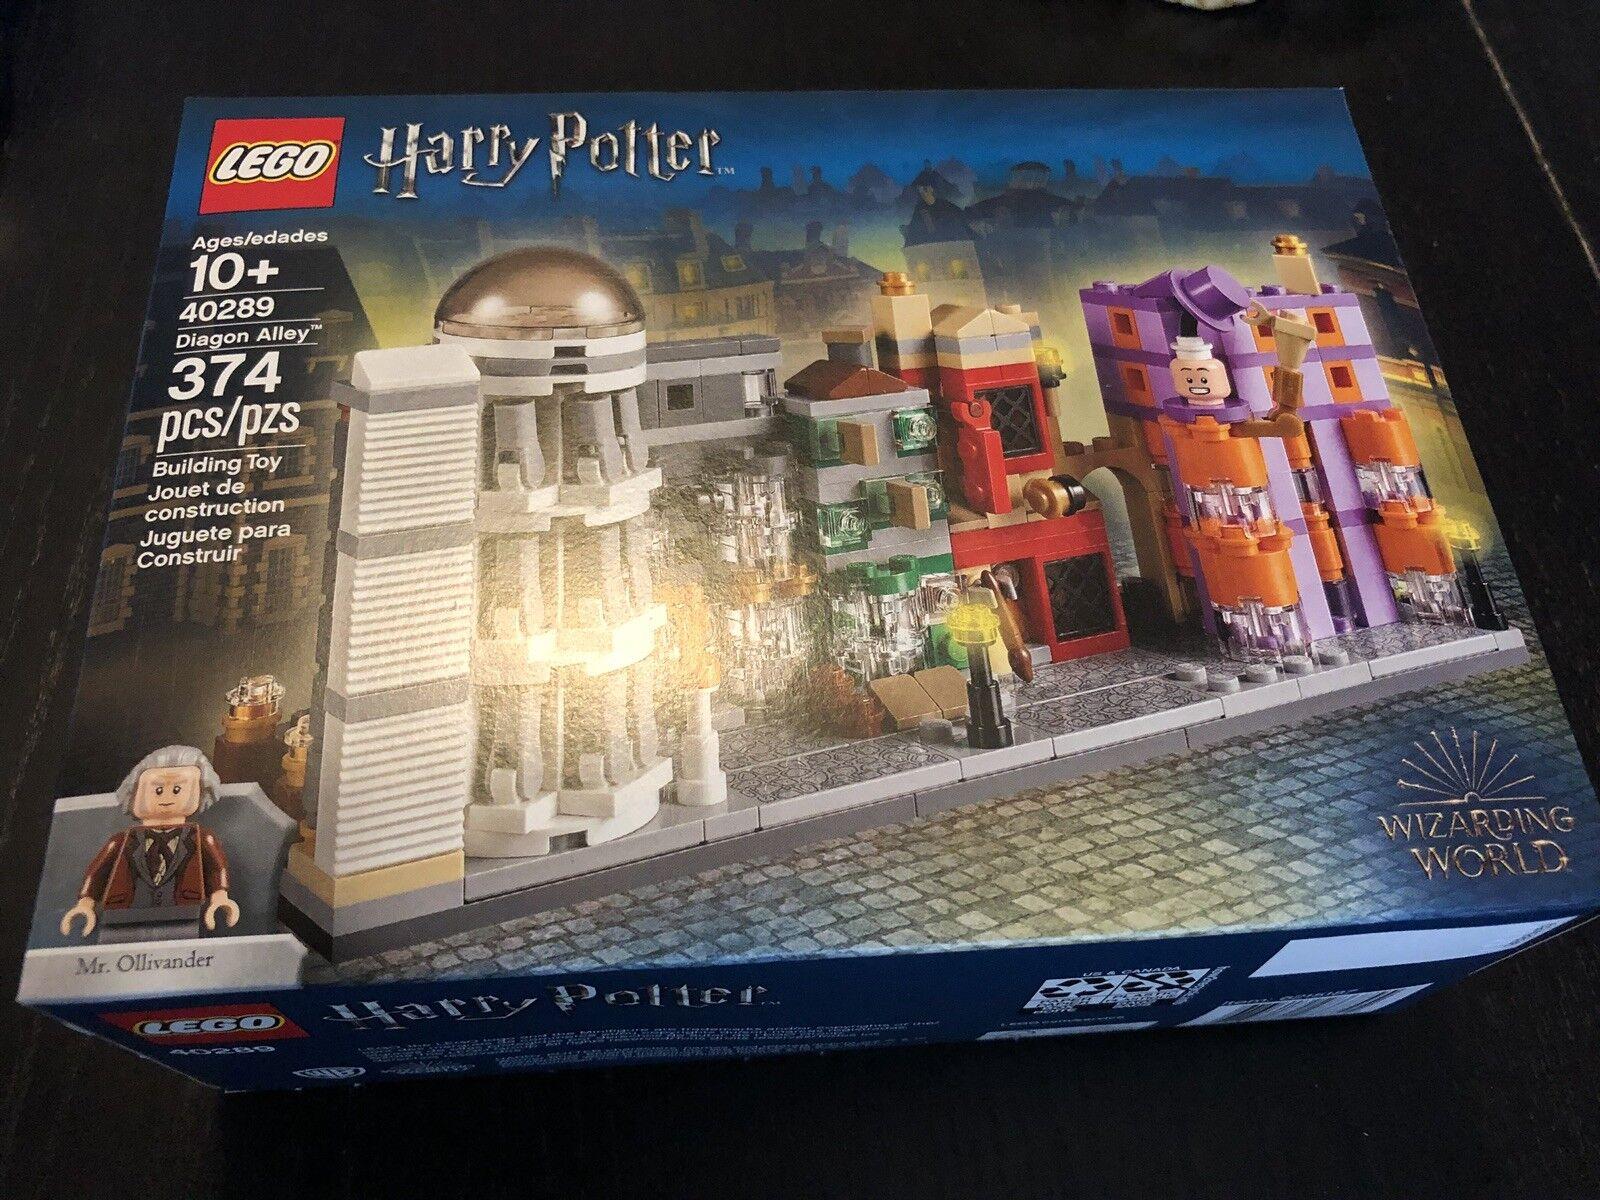 LEGO 40289 Harry Potter Diagon Alley Micro Build FREE SHIPPING